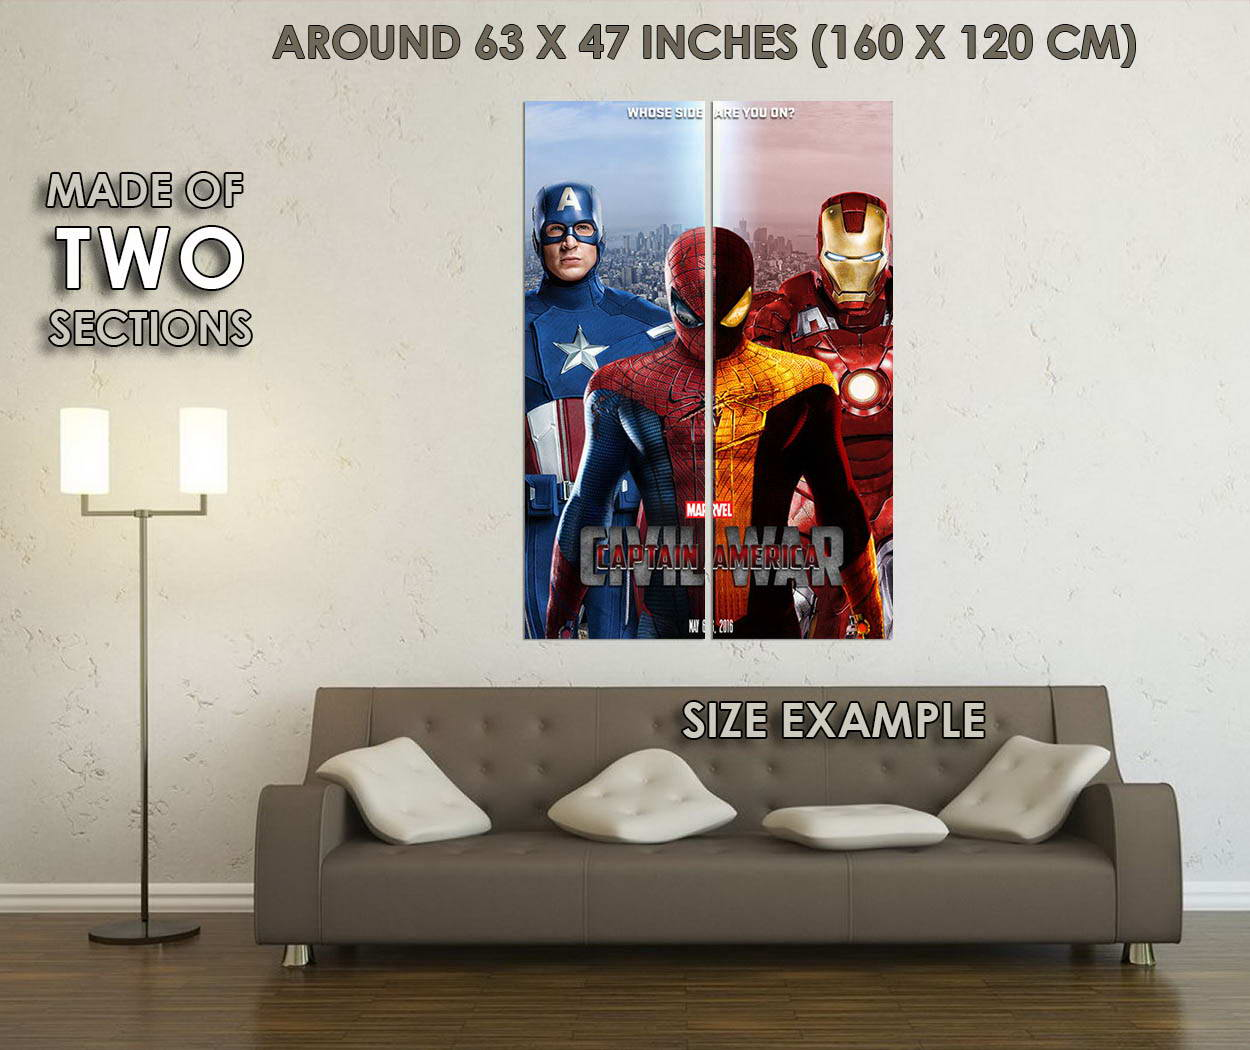 10202-Captain-America-3-Civil-War-Iron-Man-LAMINATED-POSTER-CA thumbnail 6